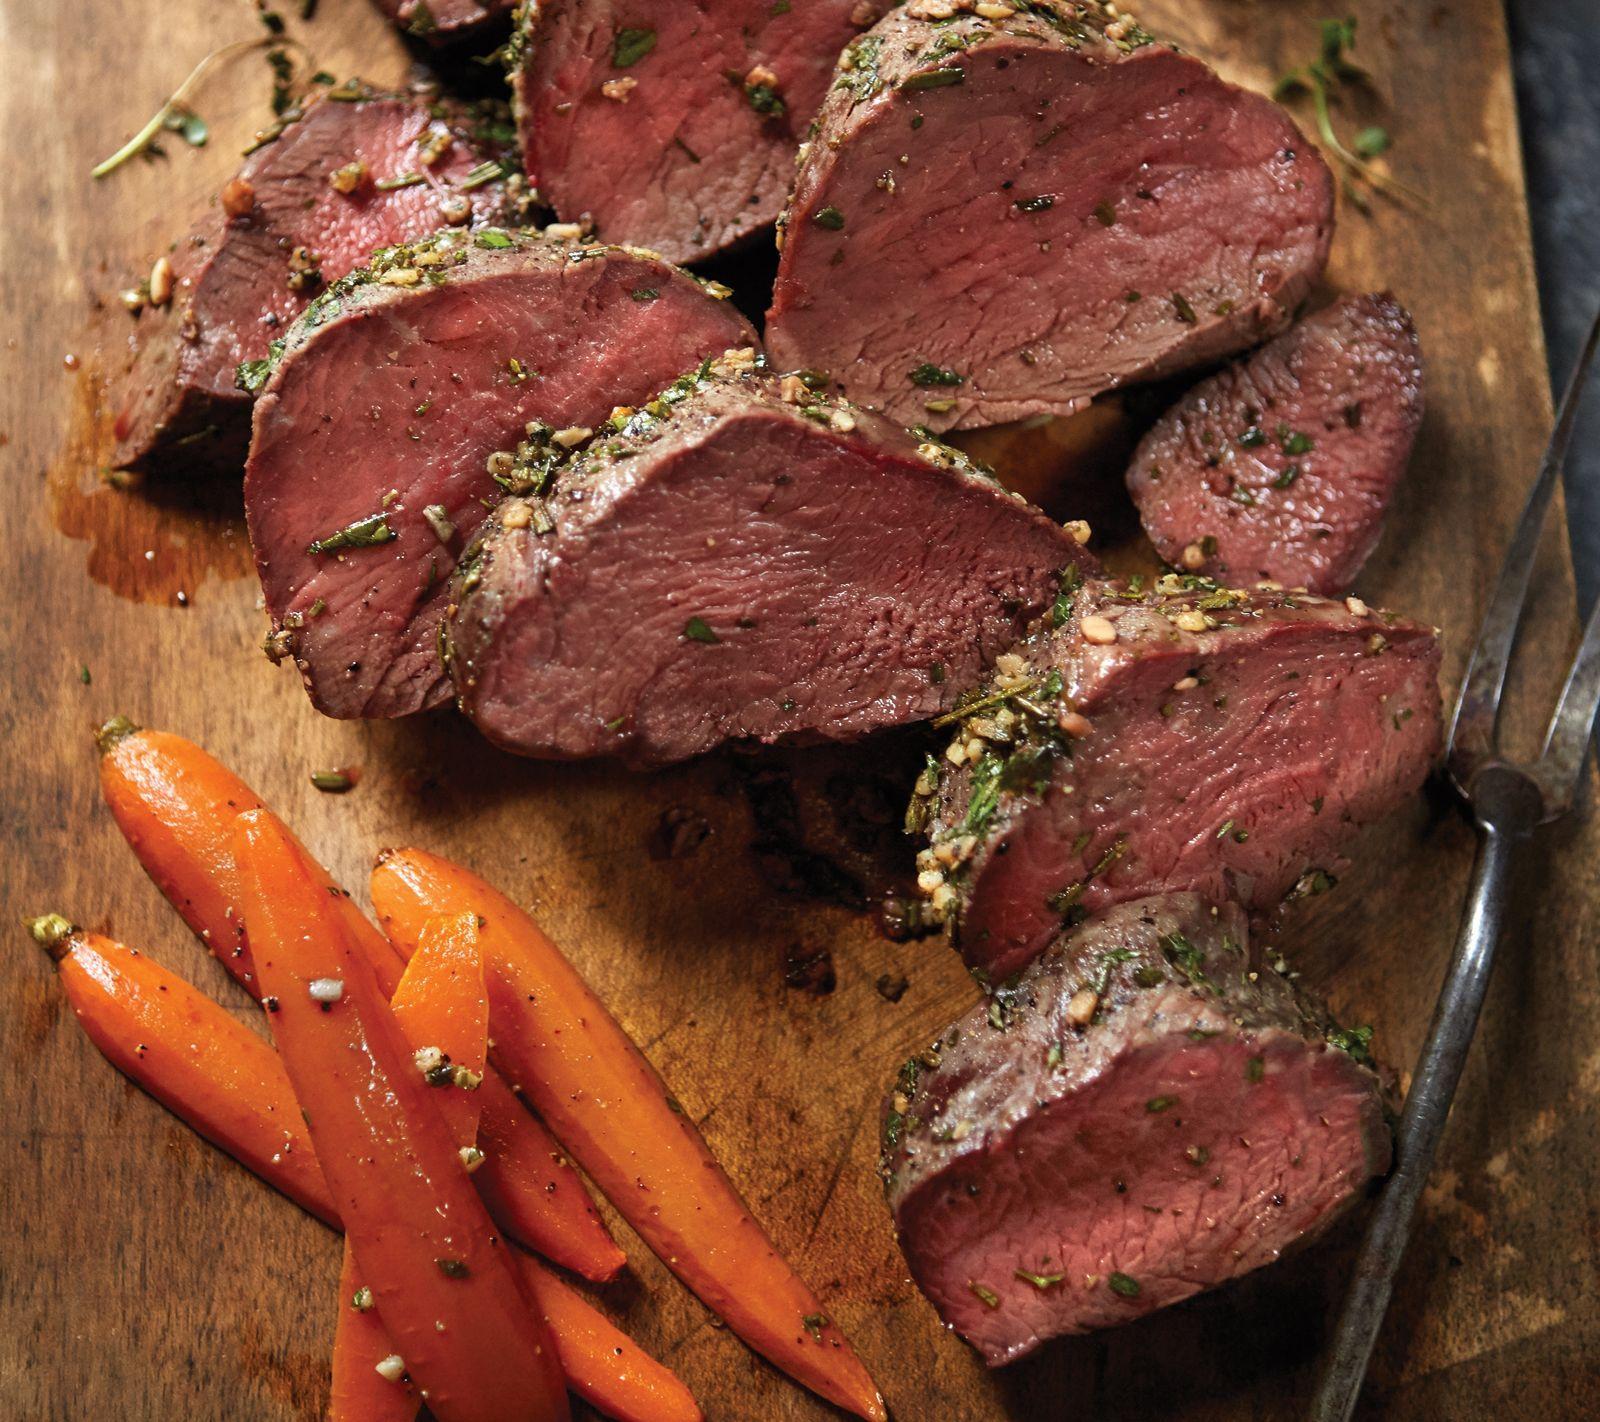 New Kansas City Steak Co 2 32 Oz Chateaubriandroasts M34813 Food Offers On Top Store Cooking Pork Tenderloin Beef Recipes Beef Tenderloin